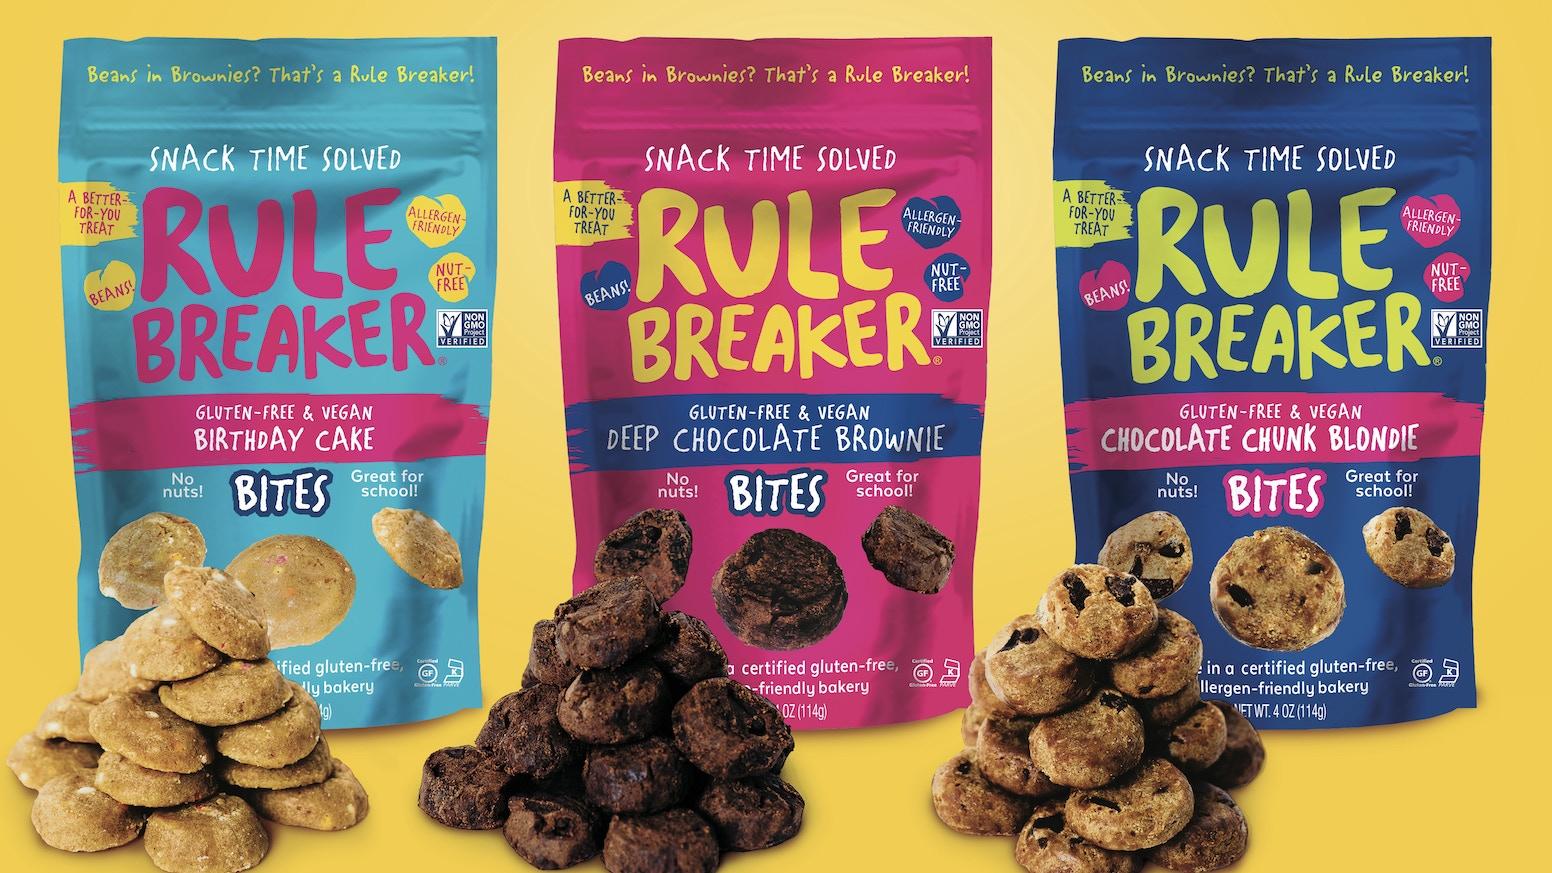 73c832d55d14 Rule Breaker Bites  Snack Time Solved! by Nancy Kalish — Kickstarter